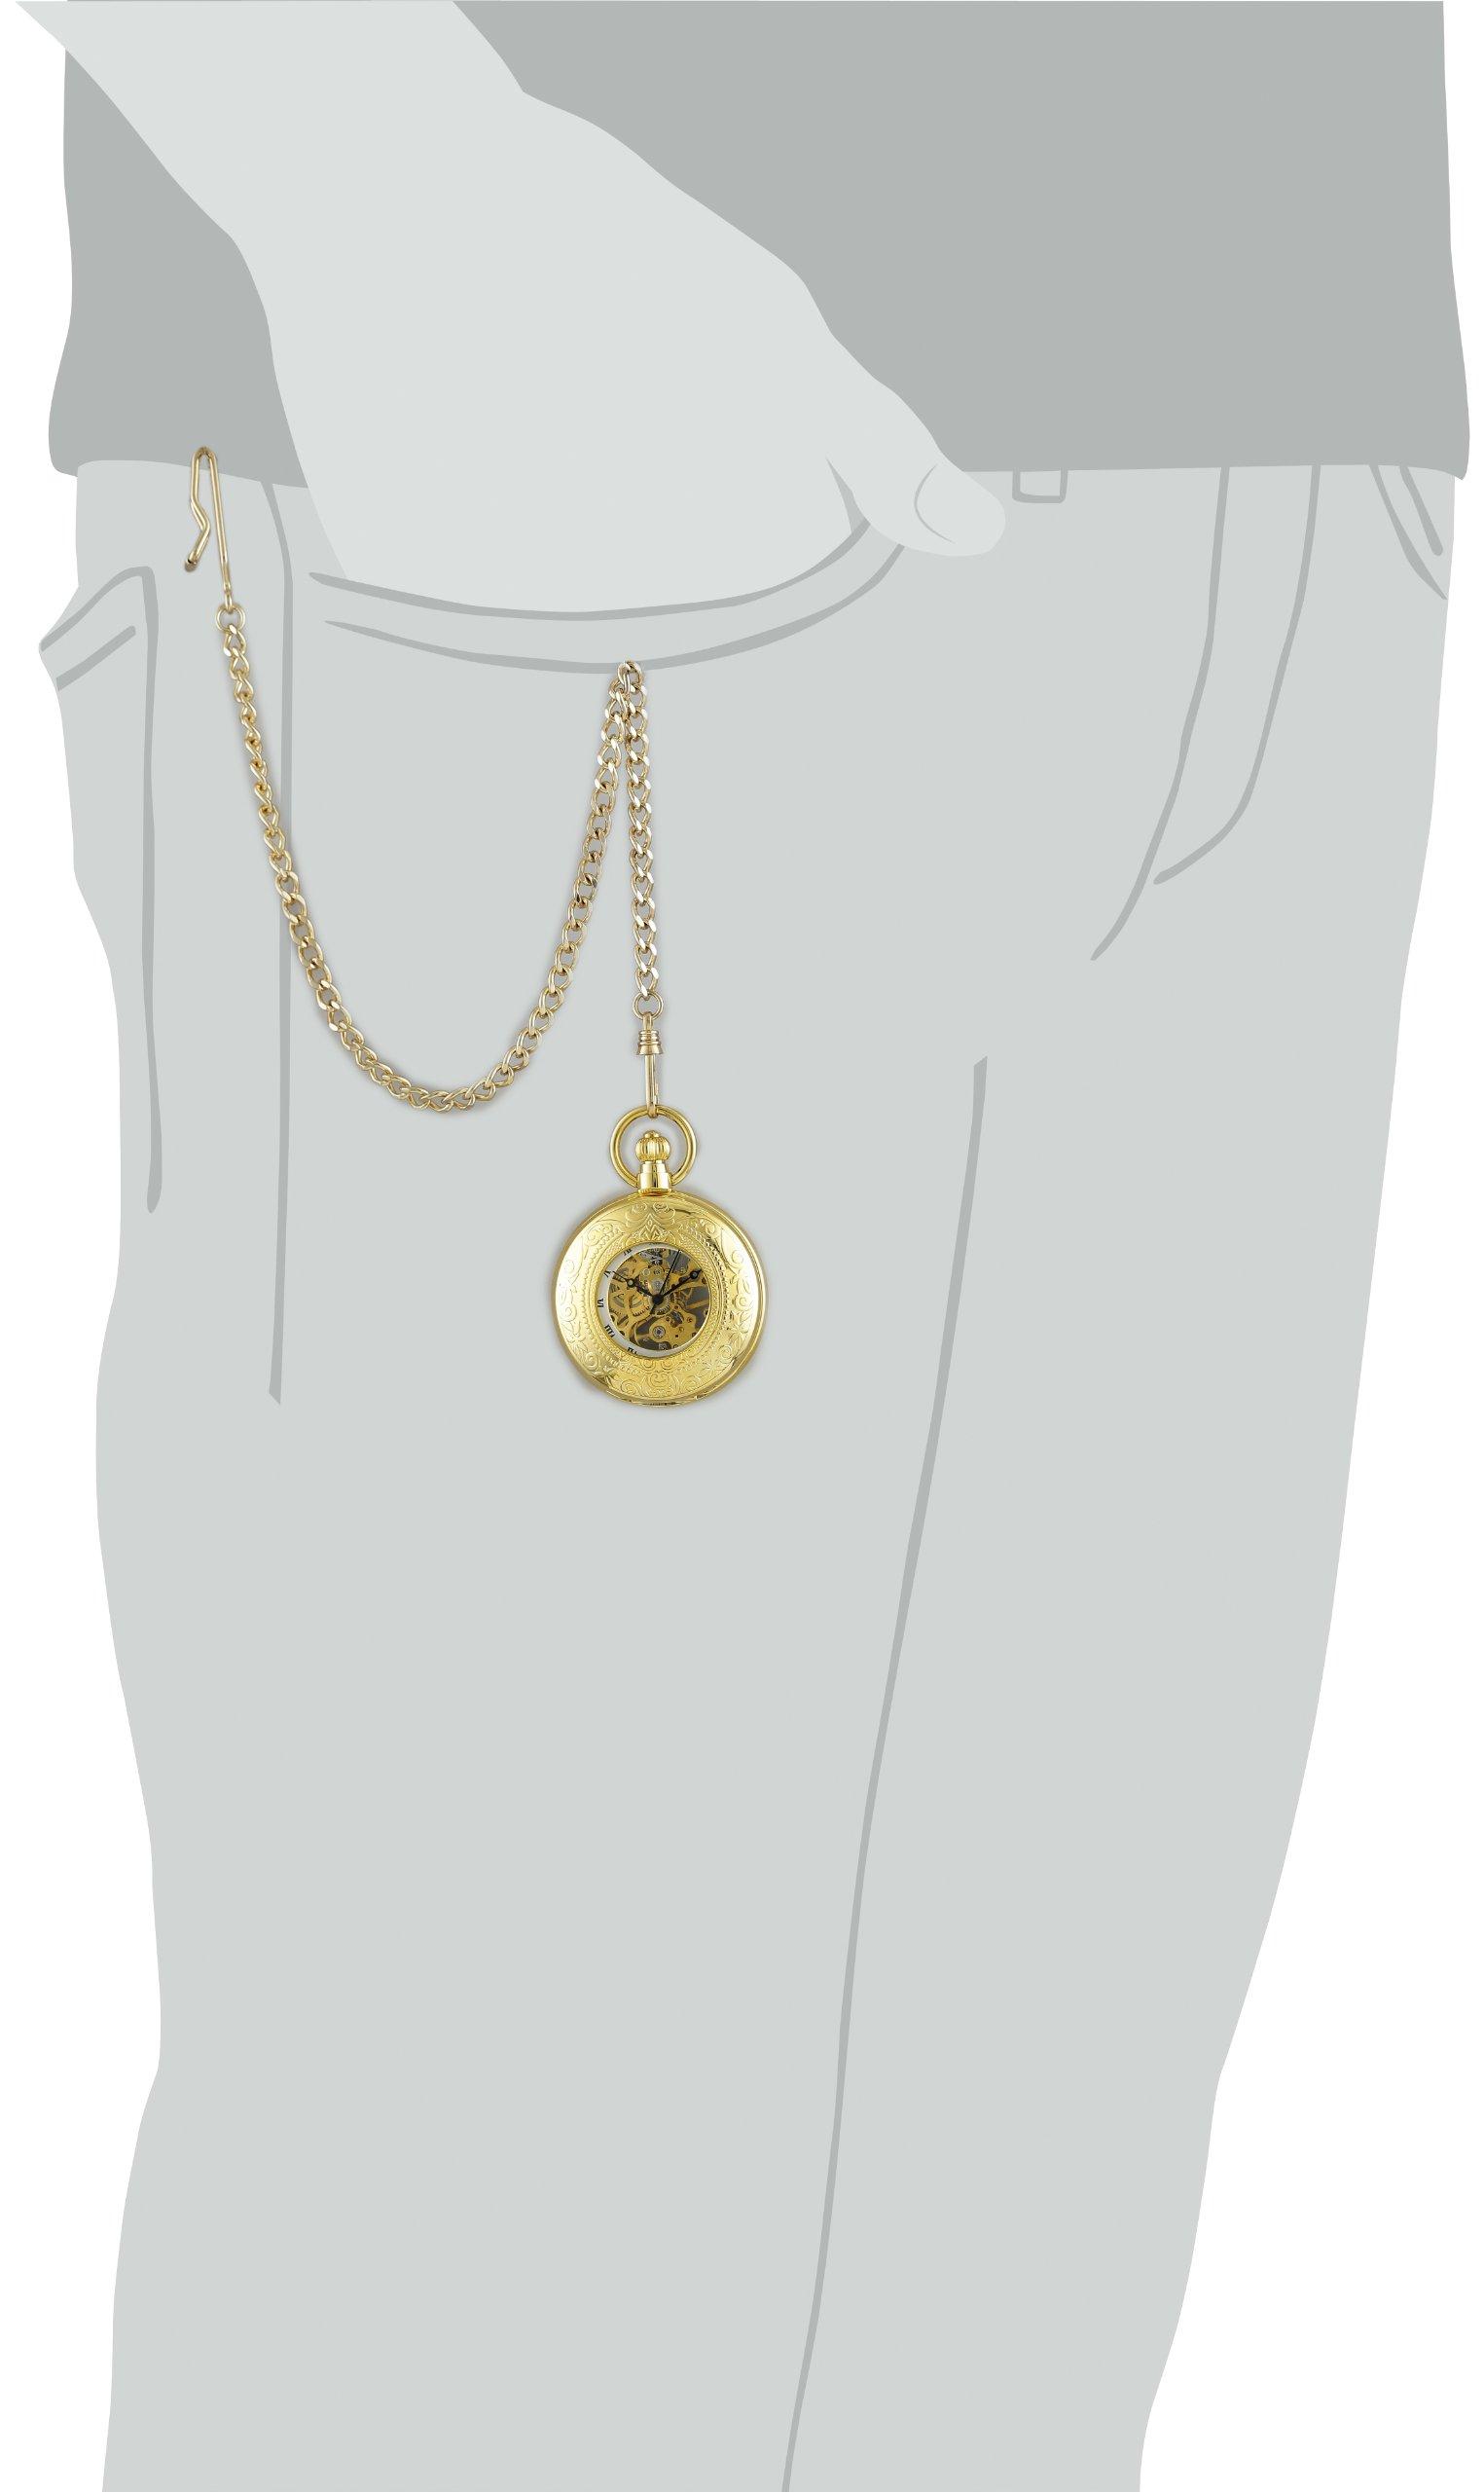 Charles-Hubert, Paris Gold-Plated Mechanical Pocket Watch by CHARLES-HUBERT PARIS (Image #4)